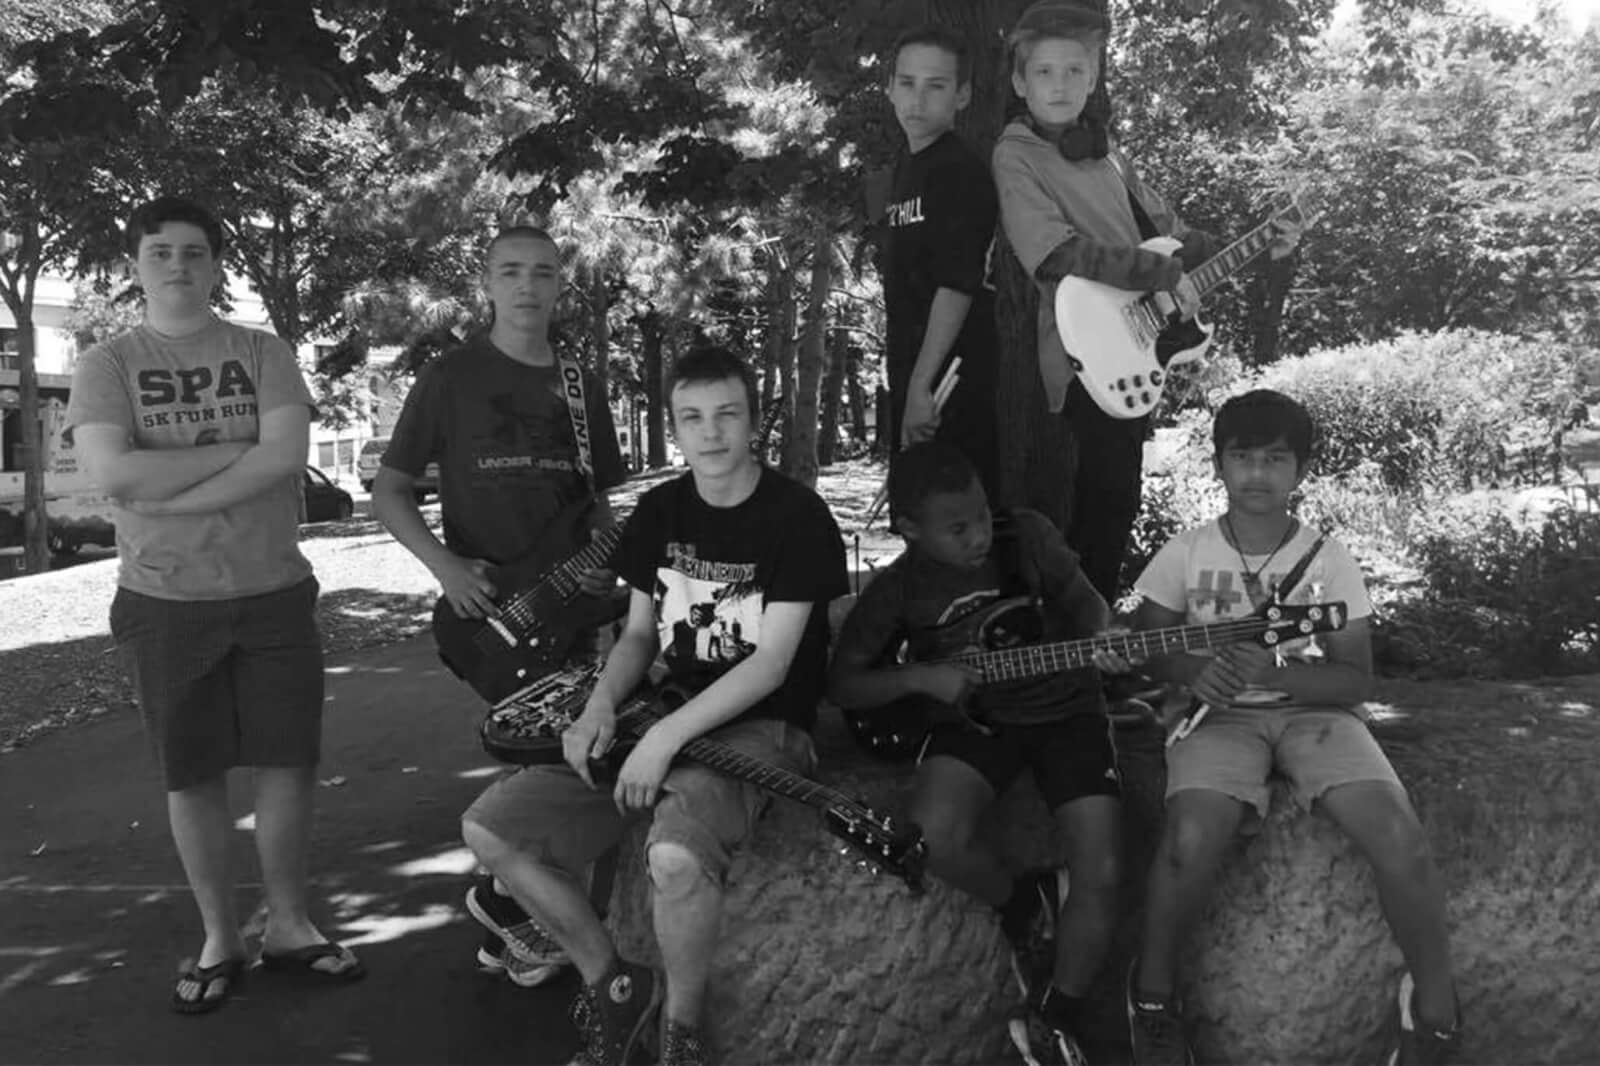 School of Rock Songwriting Camp – June 10-14